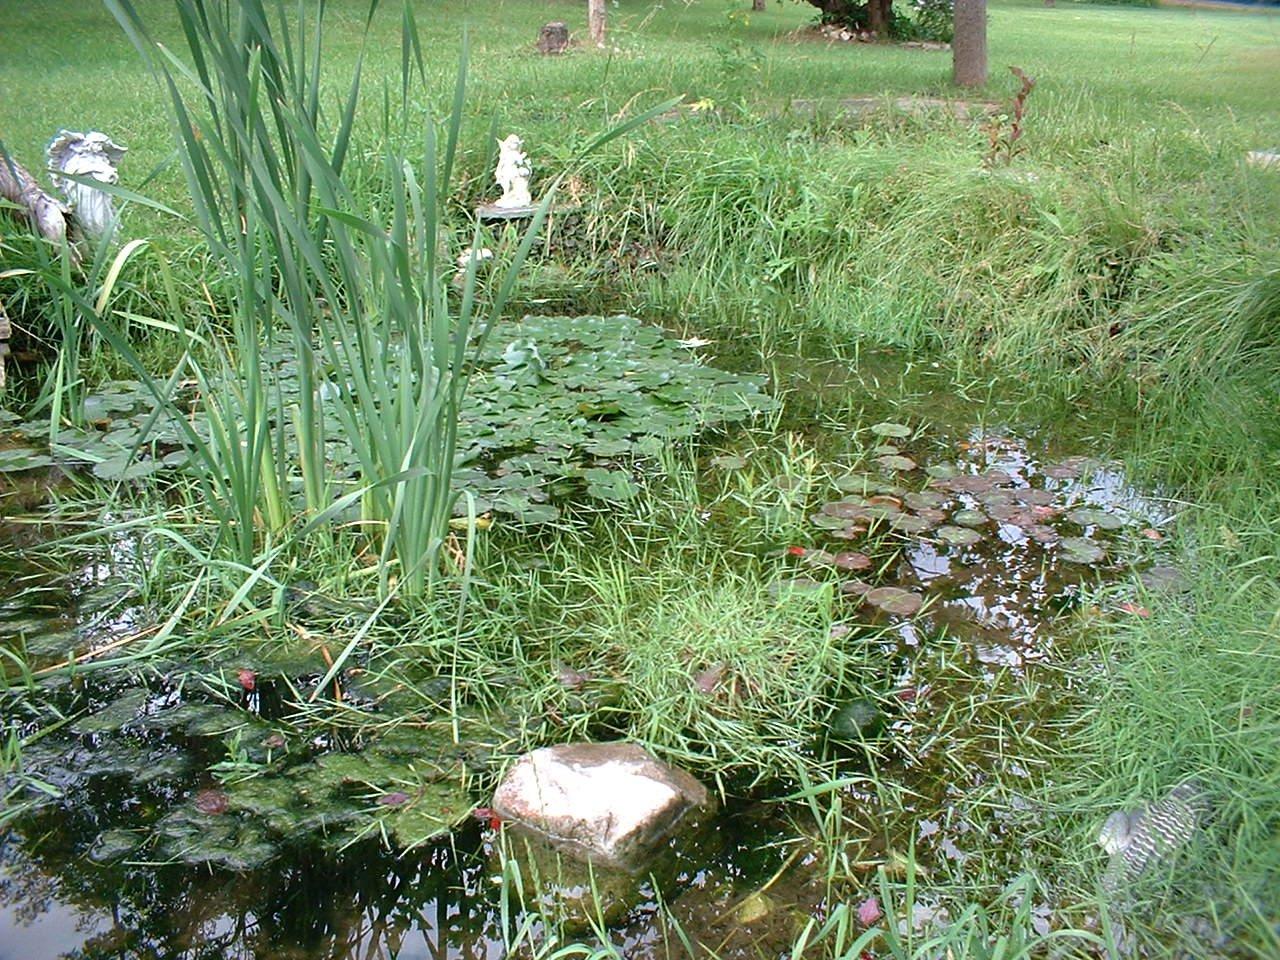 Frog Pond Backyard the frog pond | coach michele